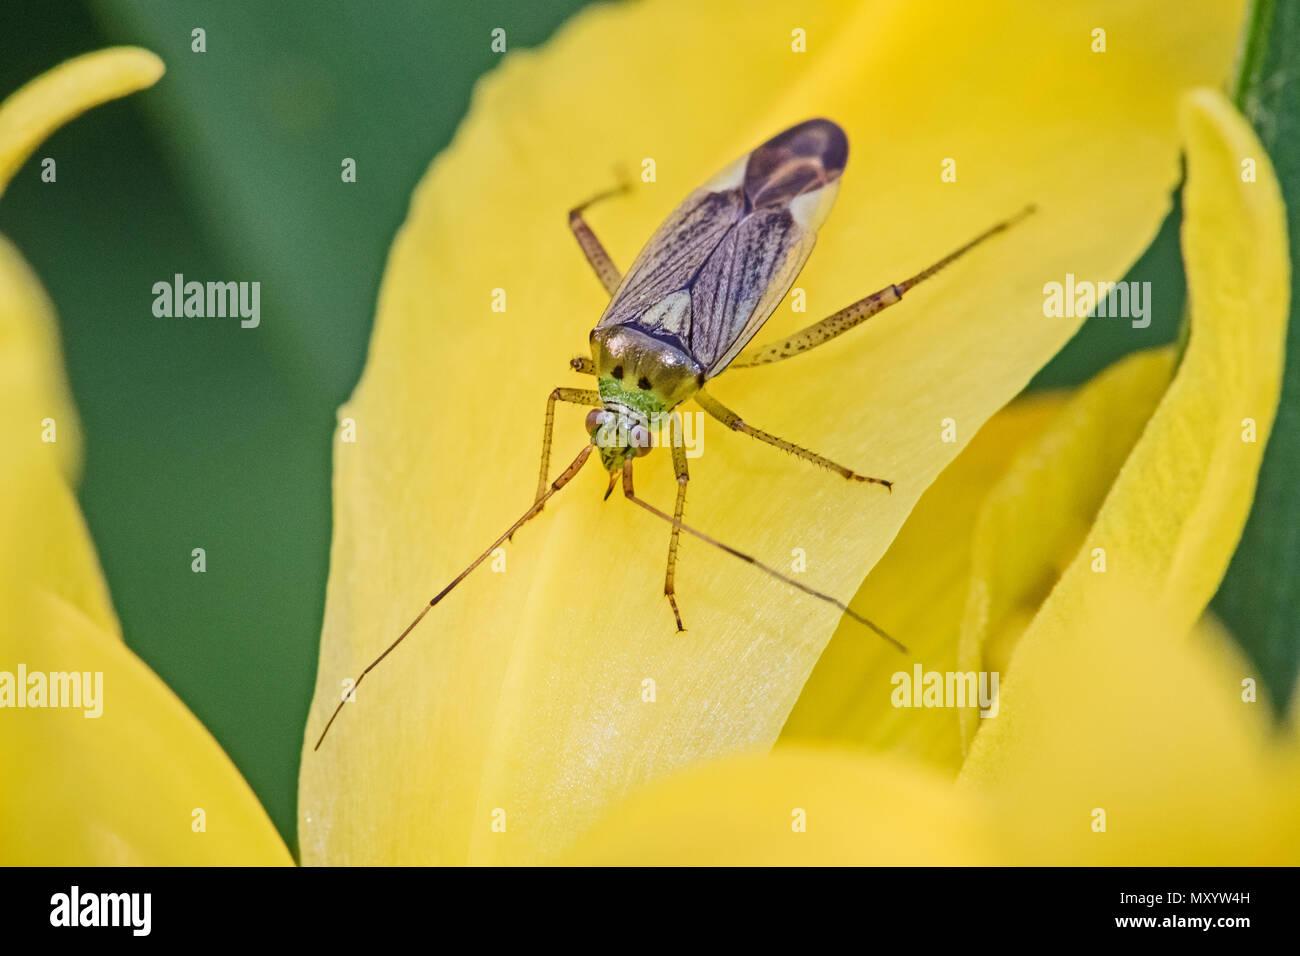 Capsid Bug  (Closterotomus trivialis)  on yellow iris - Stock Image